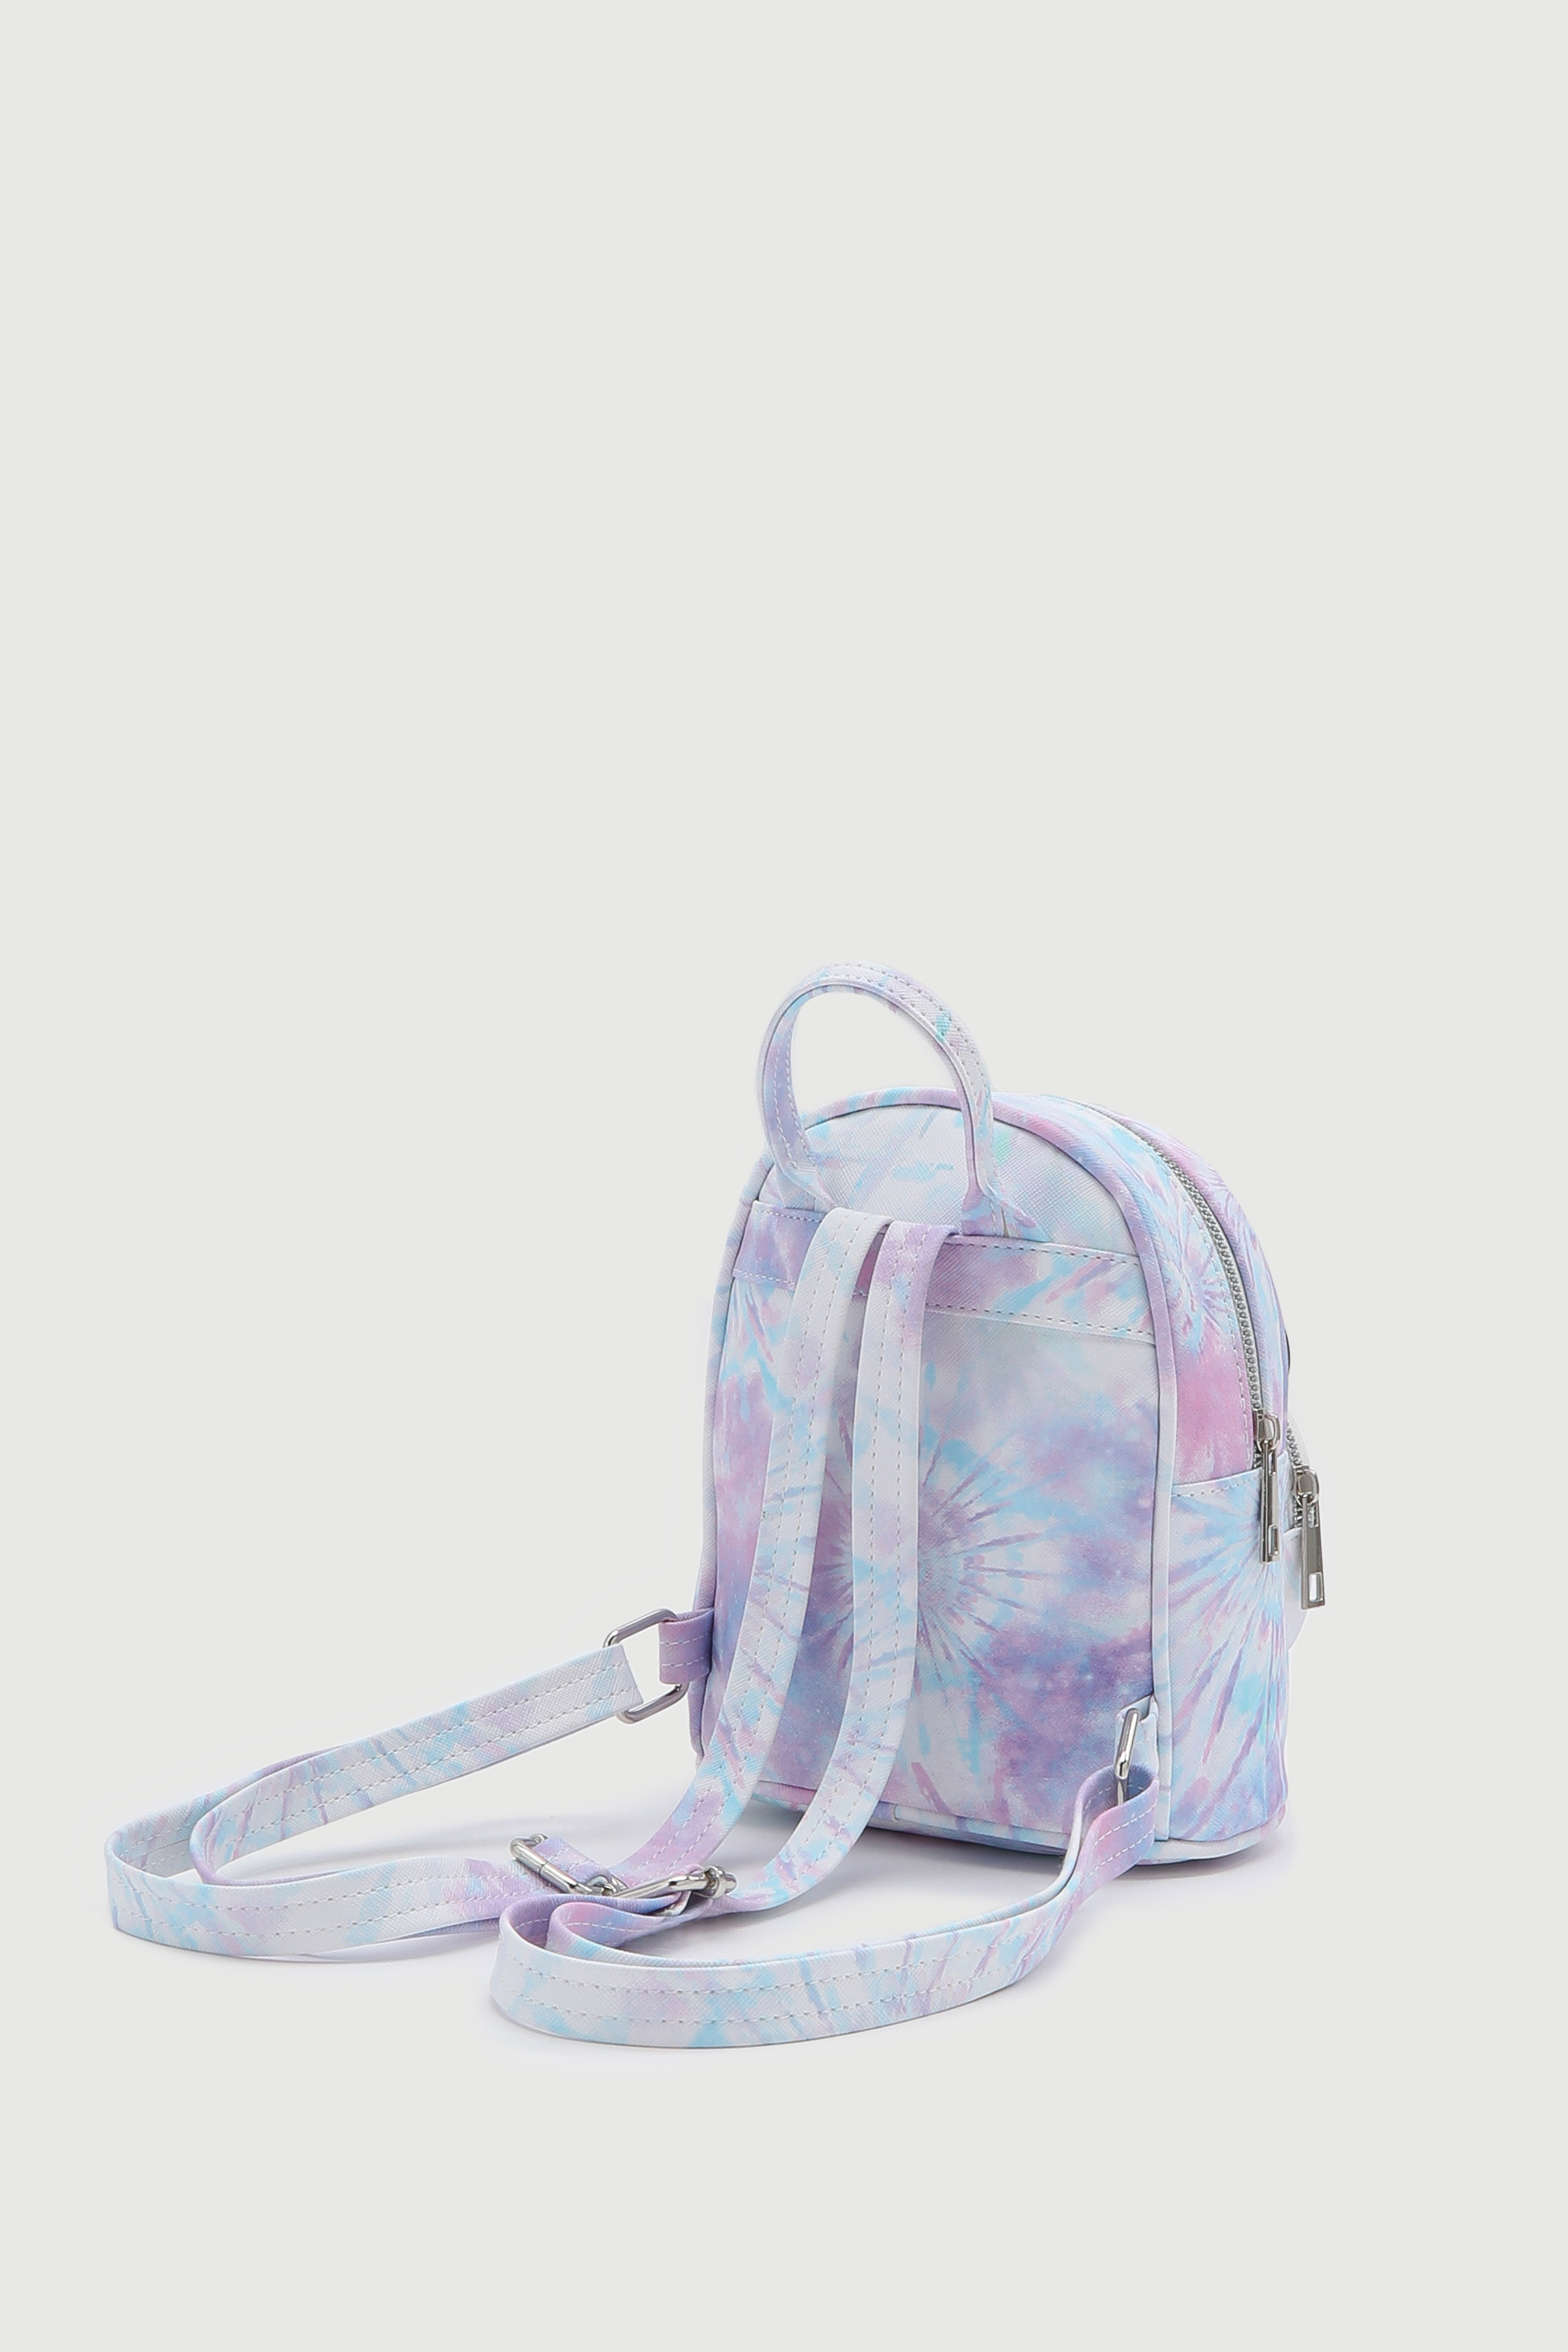 Tie-dye Unicorn Backpack for Girls